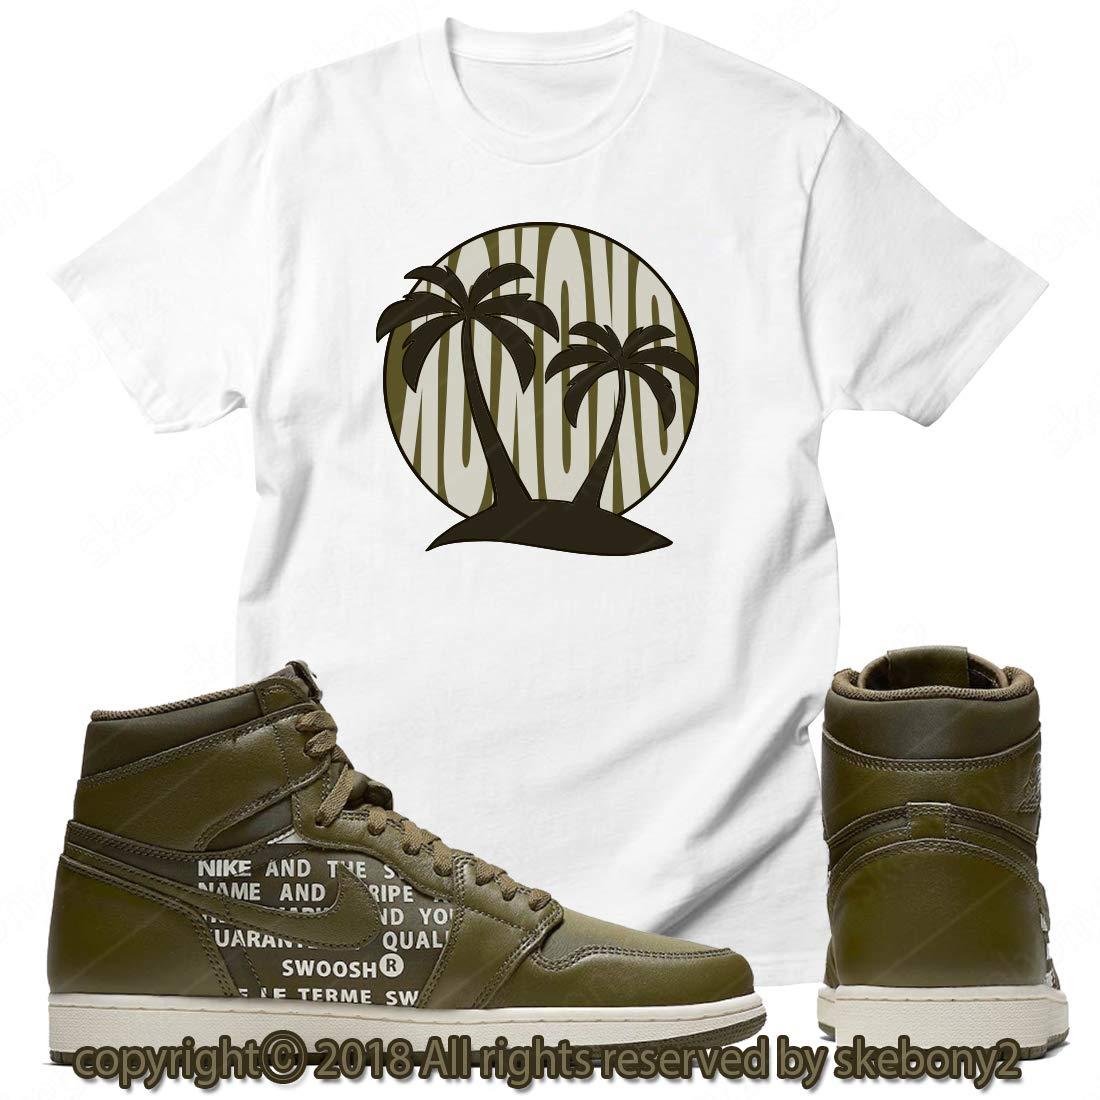 76ece7aa8092 Custom T Shirt Matching Air Jordan 1 Retro High OG Olive Canvas JD 1-20-8  at Amazon Men s Clothing store